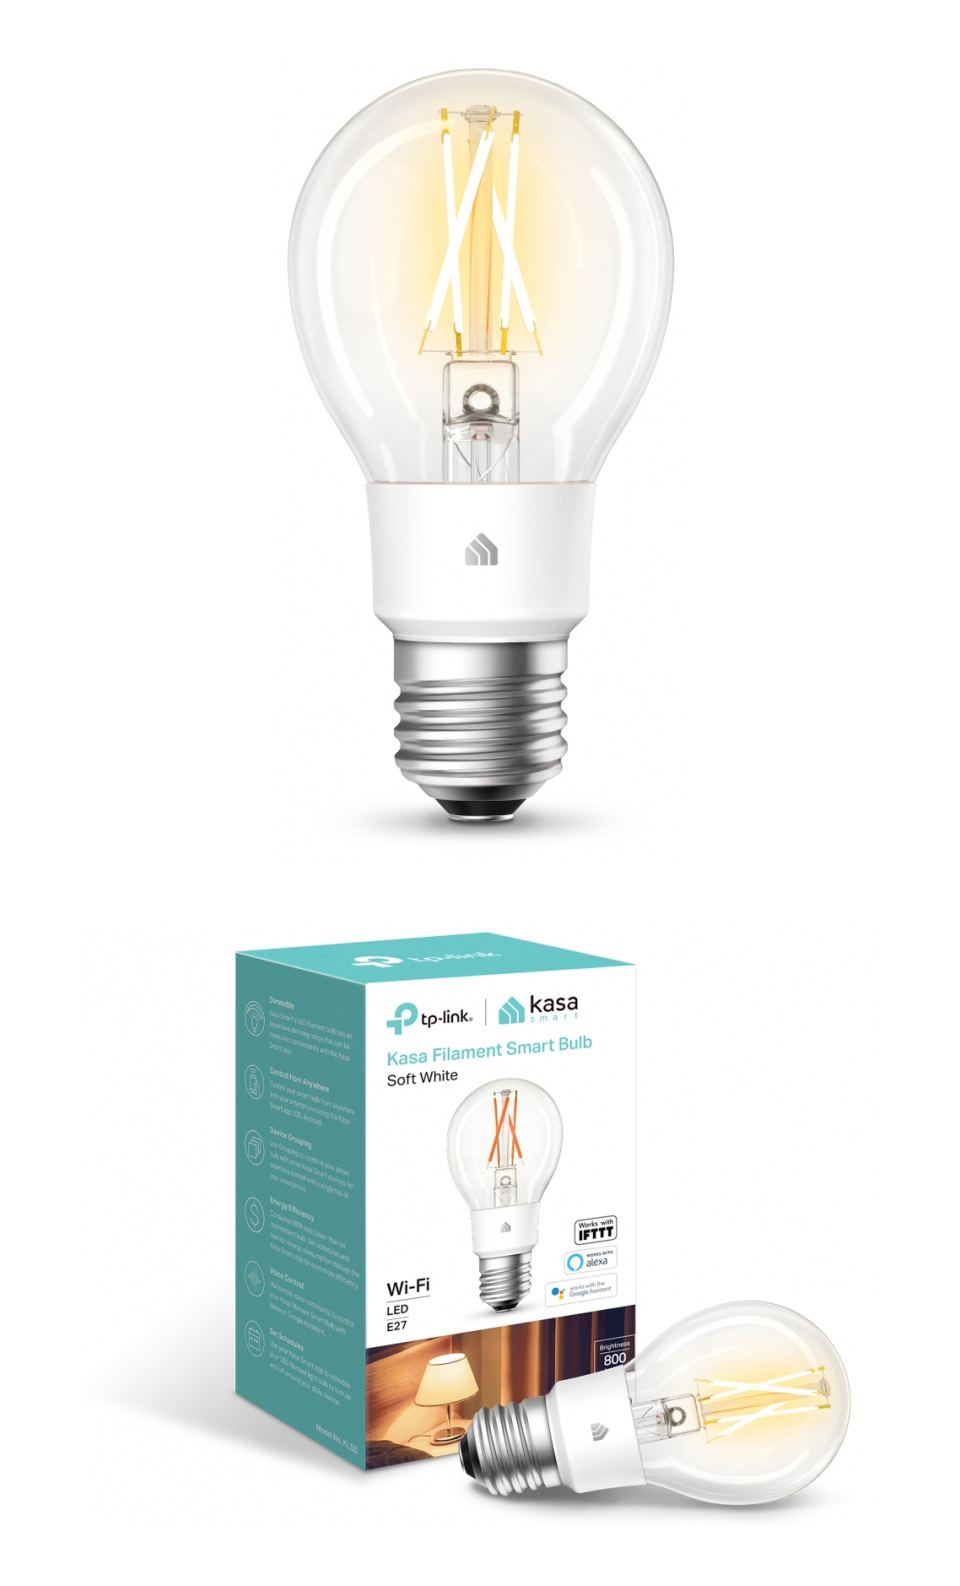 TP-Link KL50 Soft White Filament Smart Wi-Fi LED Bulb product